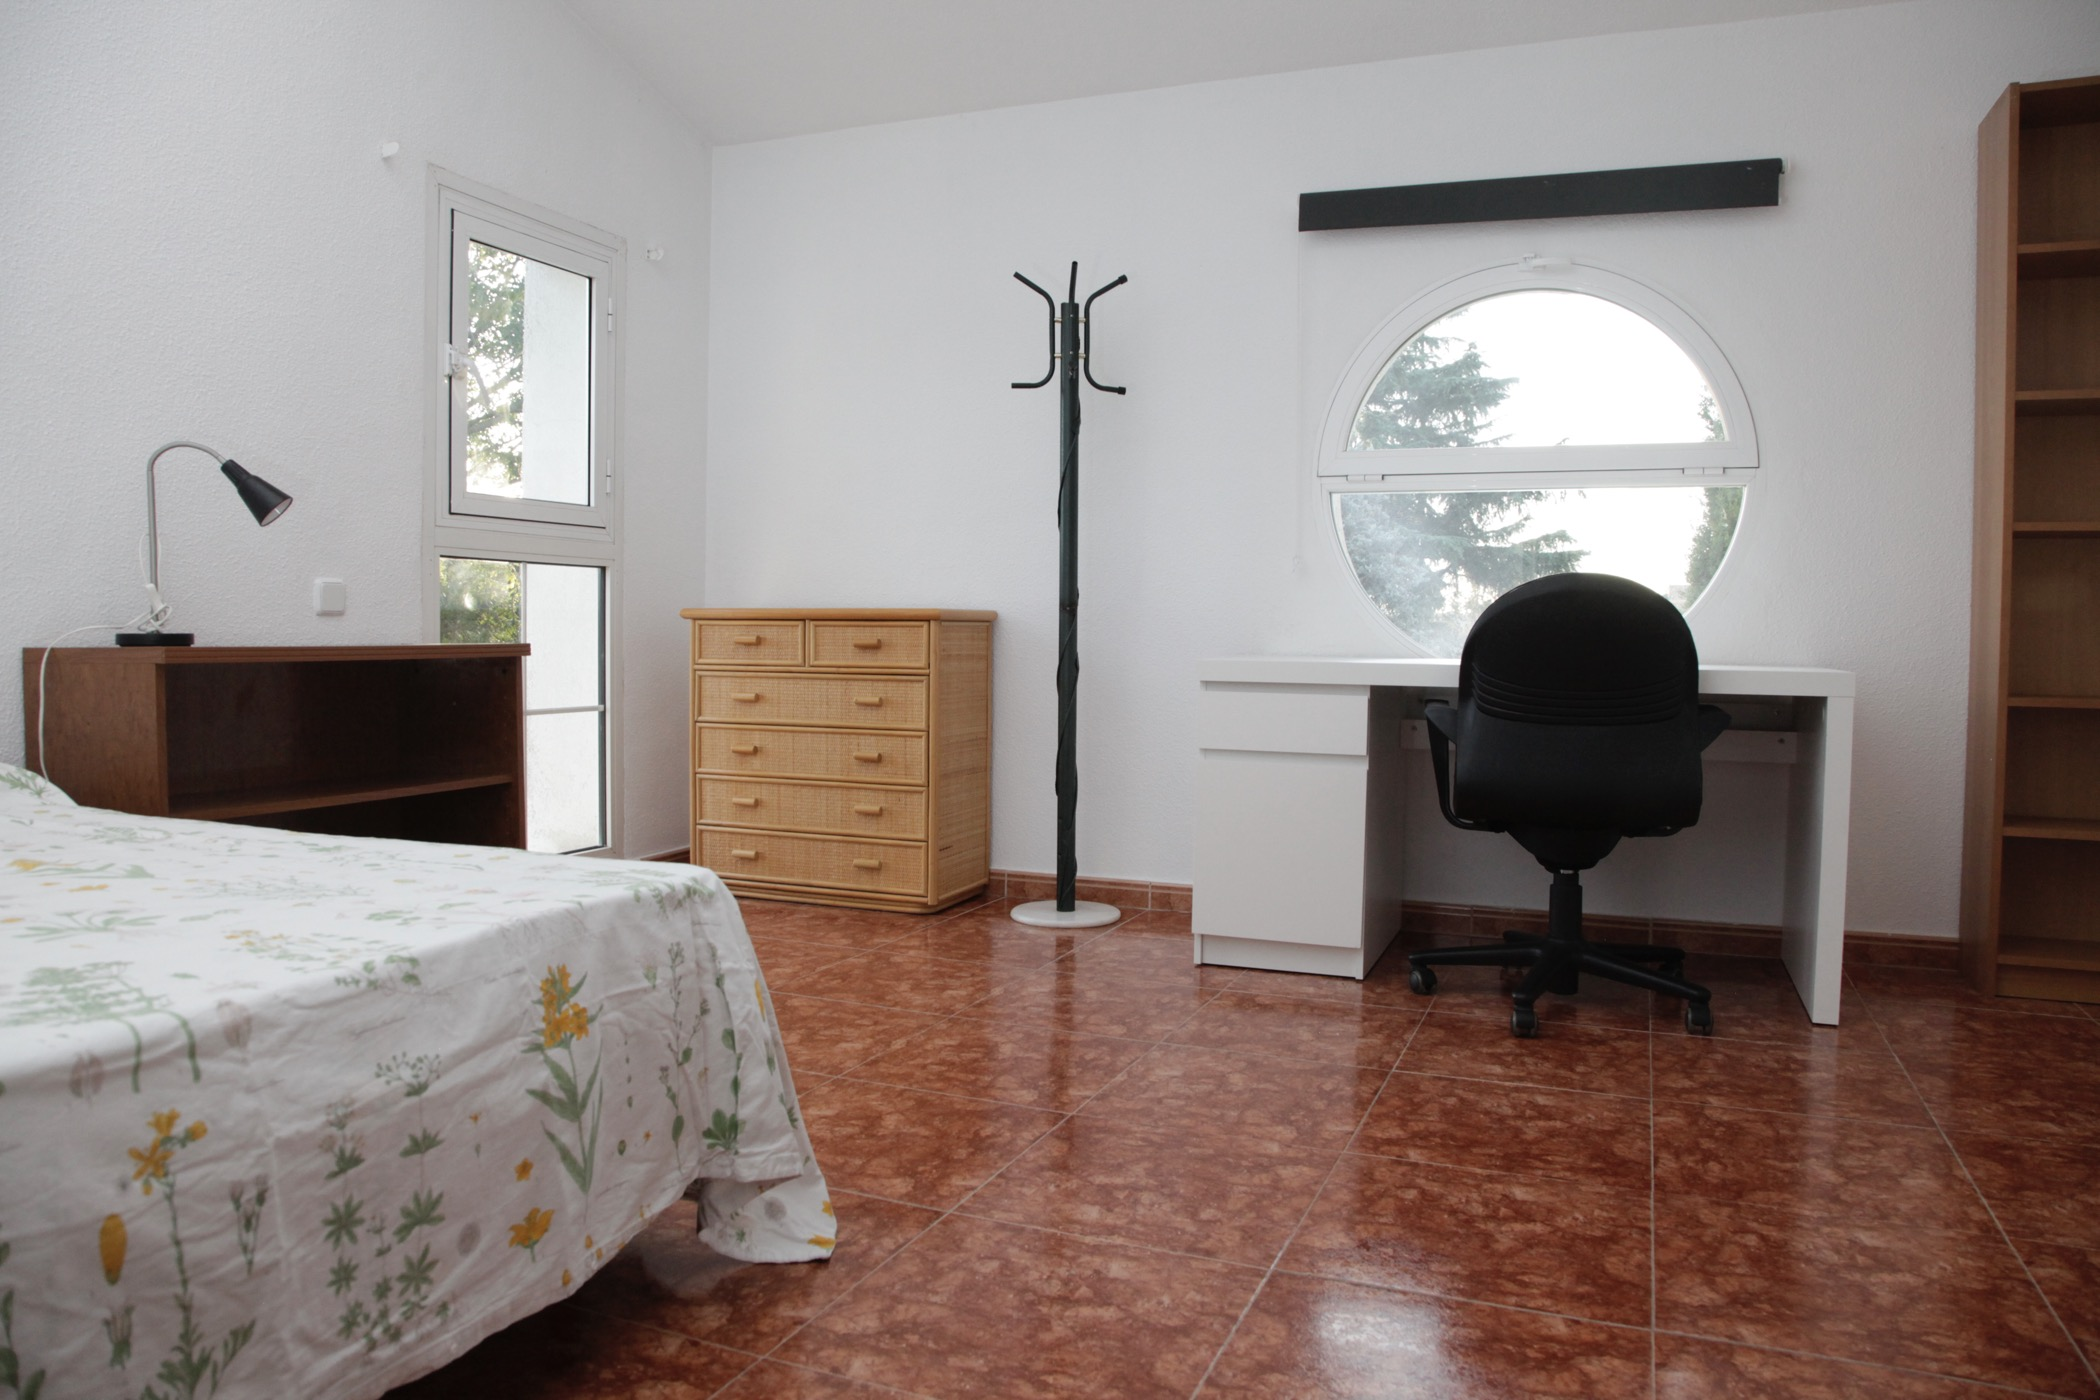 villapepa-habitaciones-13